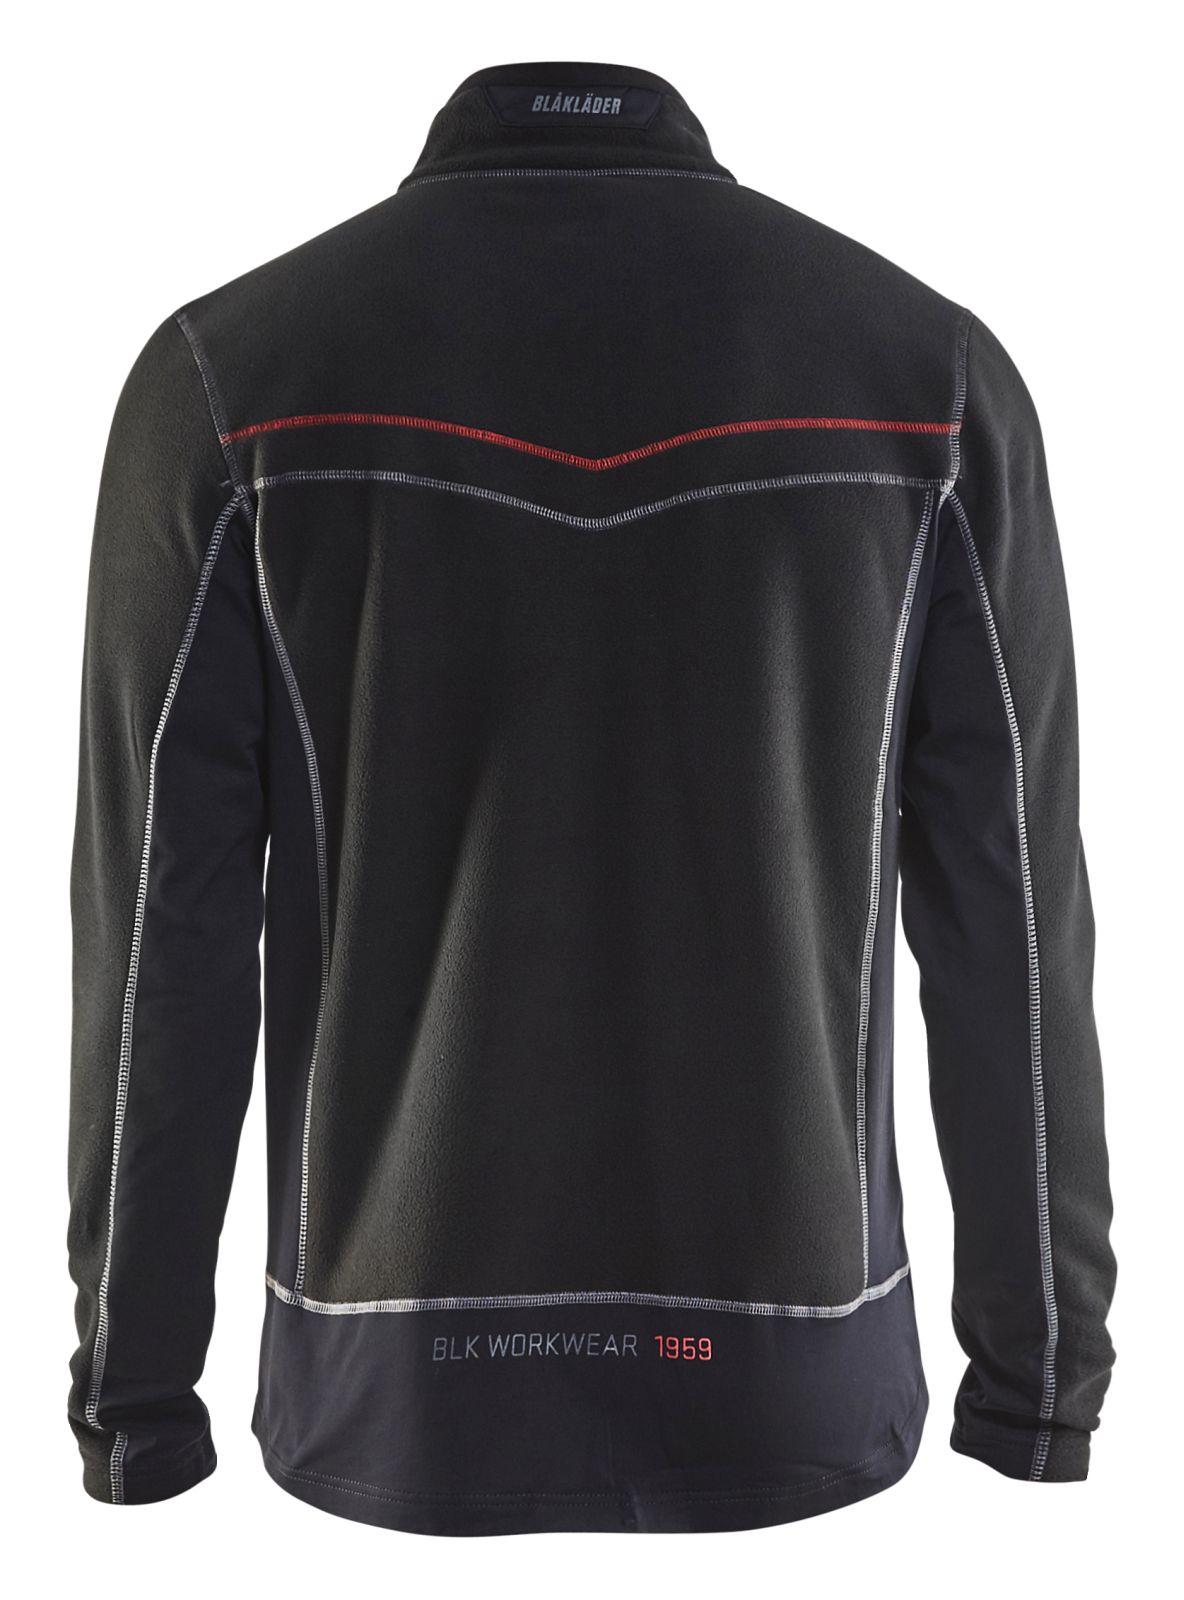 Blaklader Fleece vesten 49971010 zwart(9900)